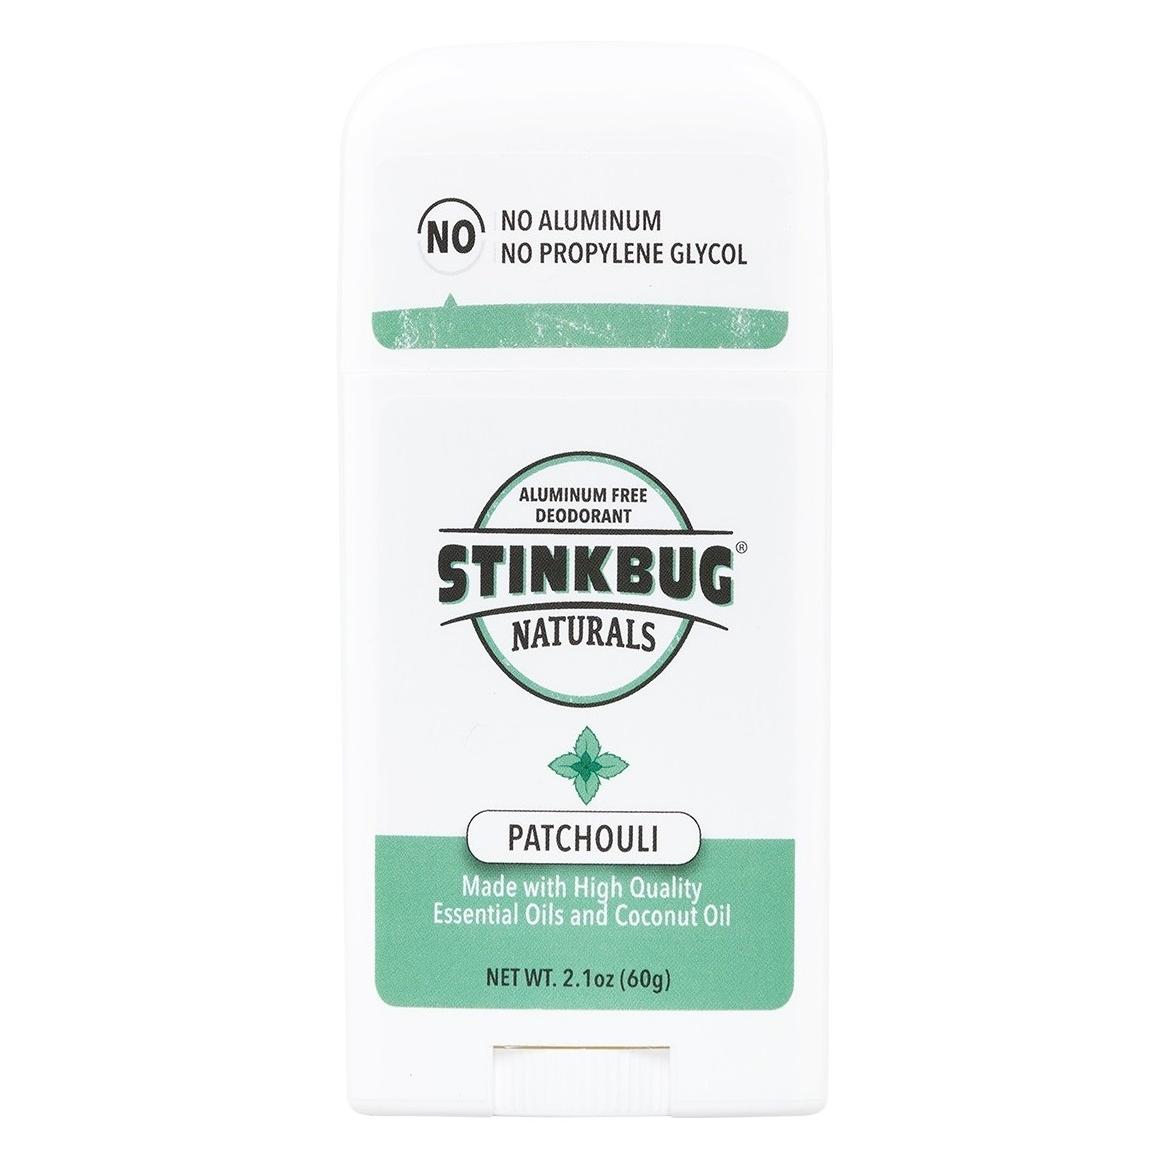 Buy Patchouli Natural Deodorant (2.1oz / 60g) Singapore